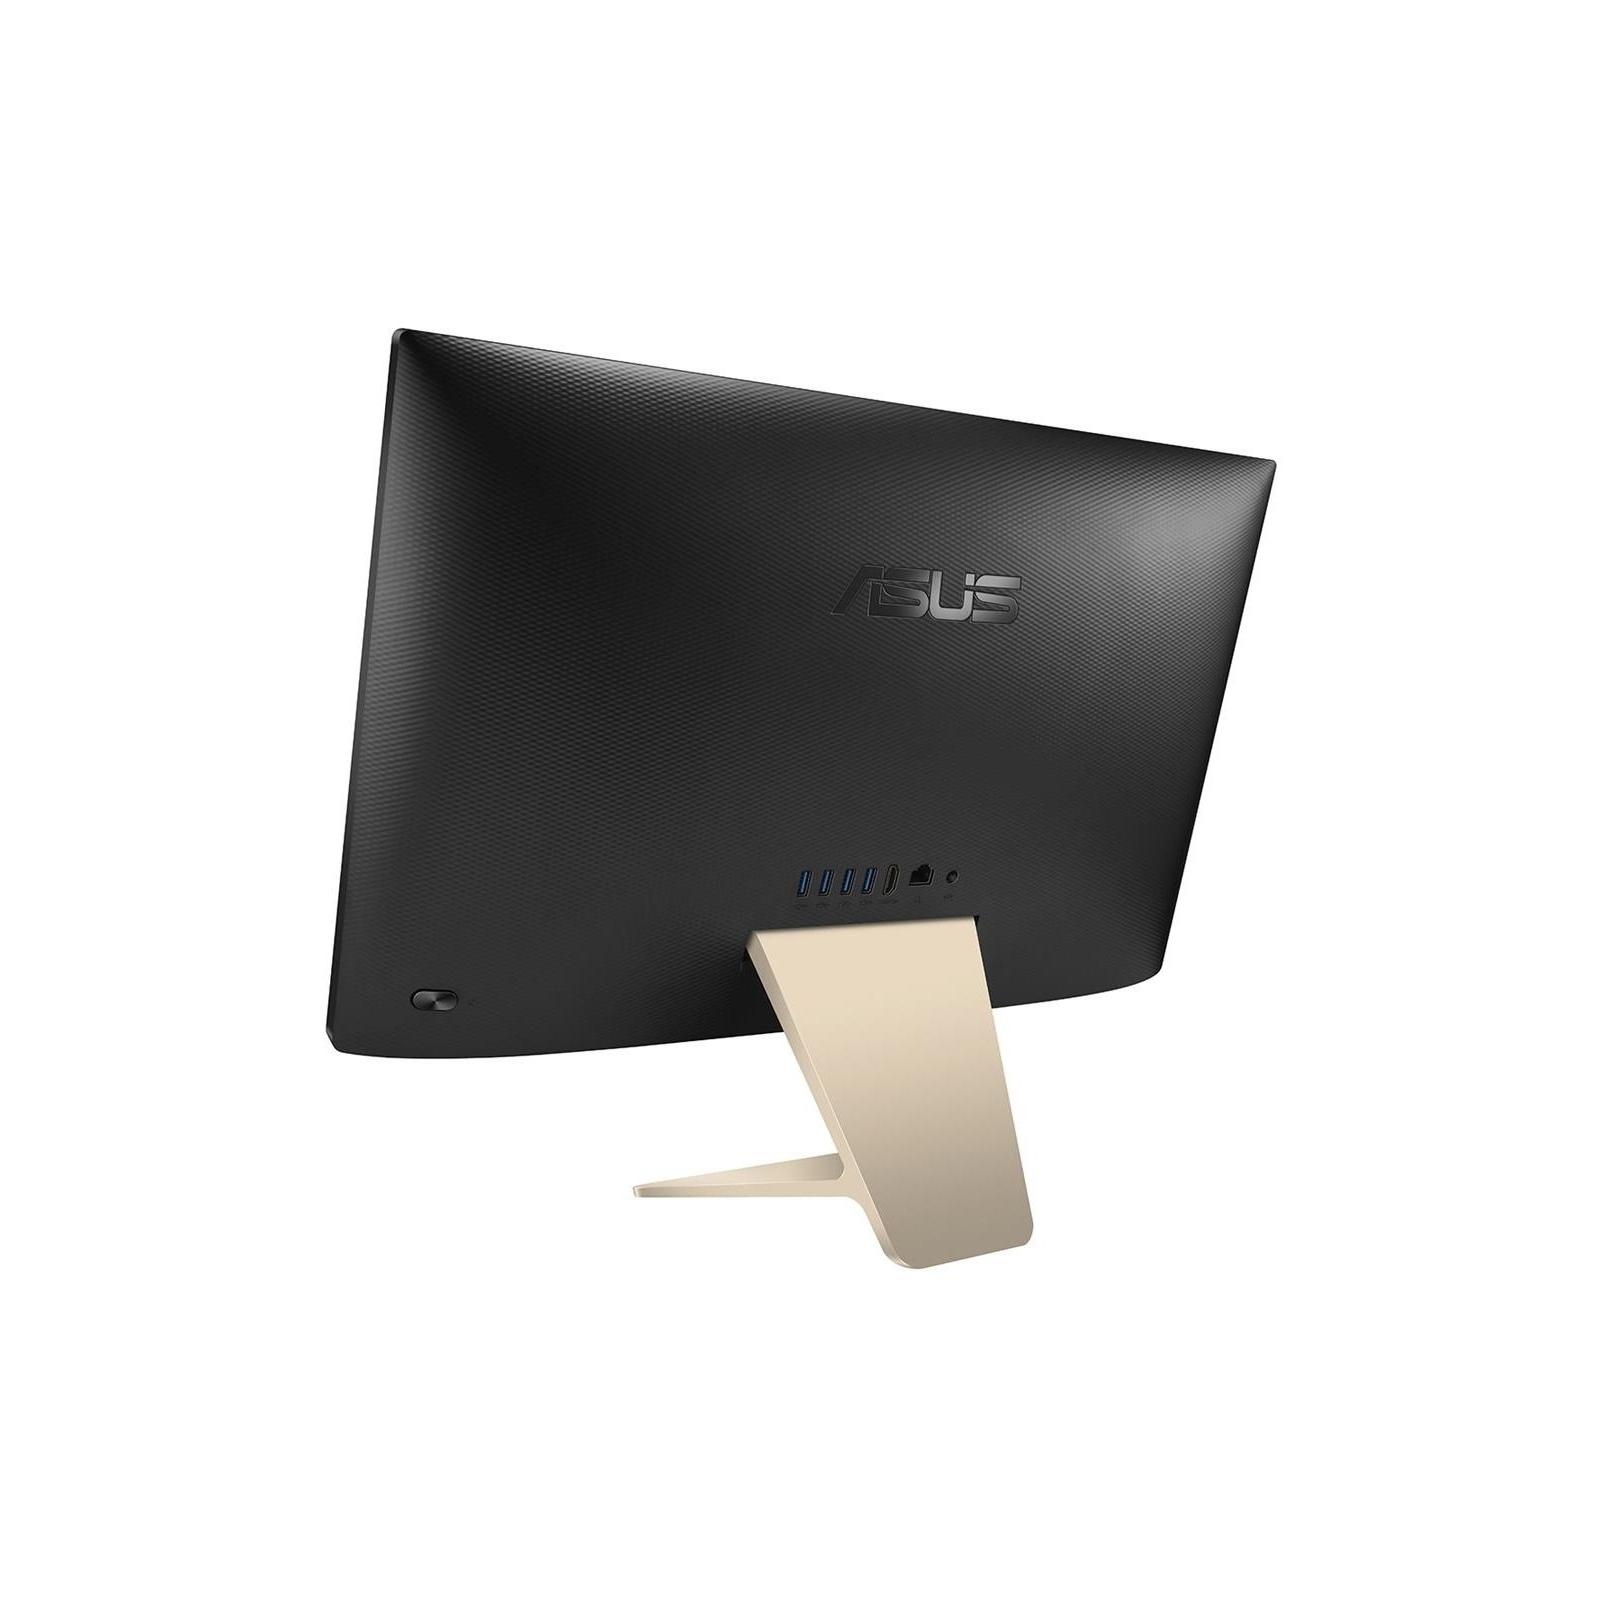 Комп'ютер ASUS V222FAK-BA030D (90PT02G1-M01450) зображення 8